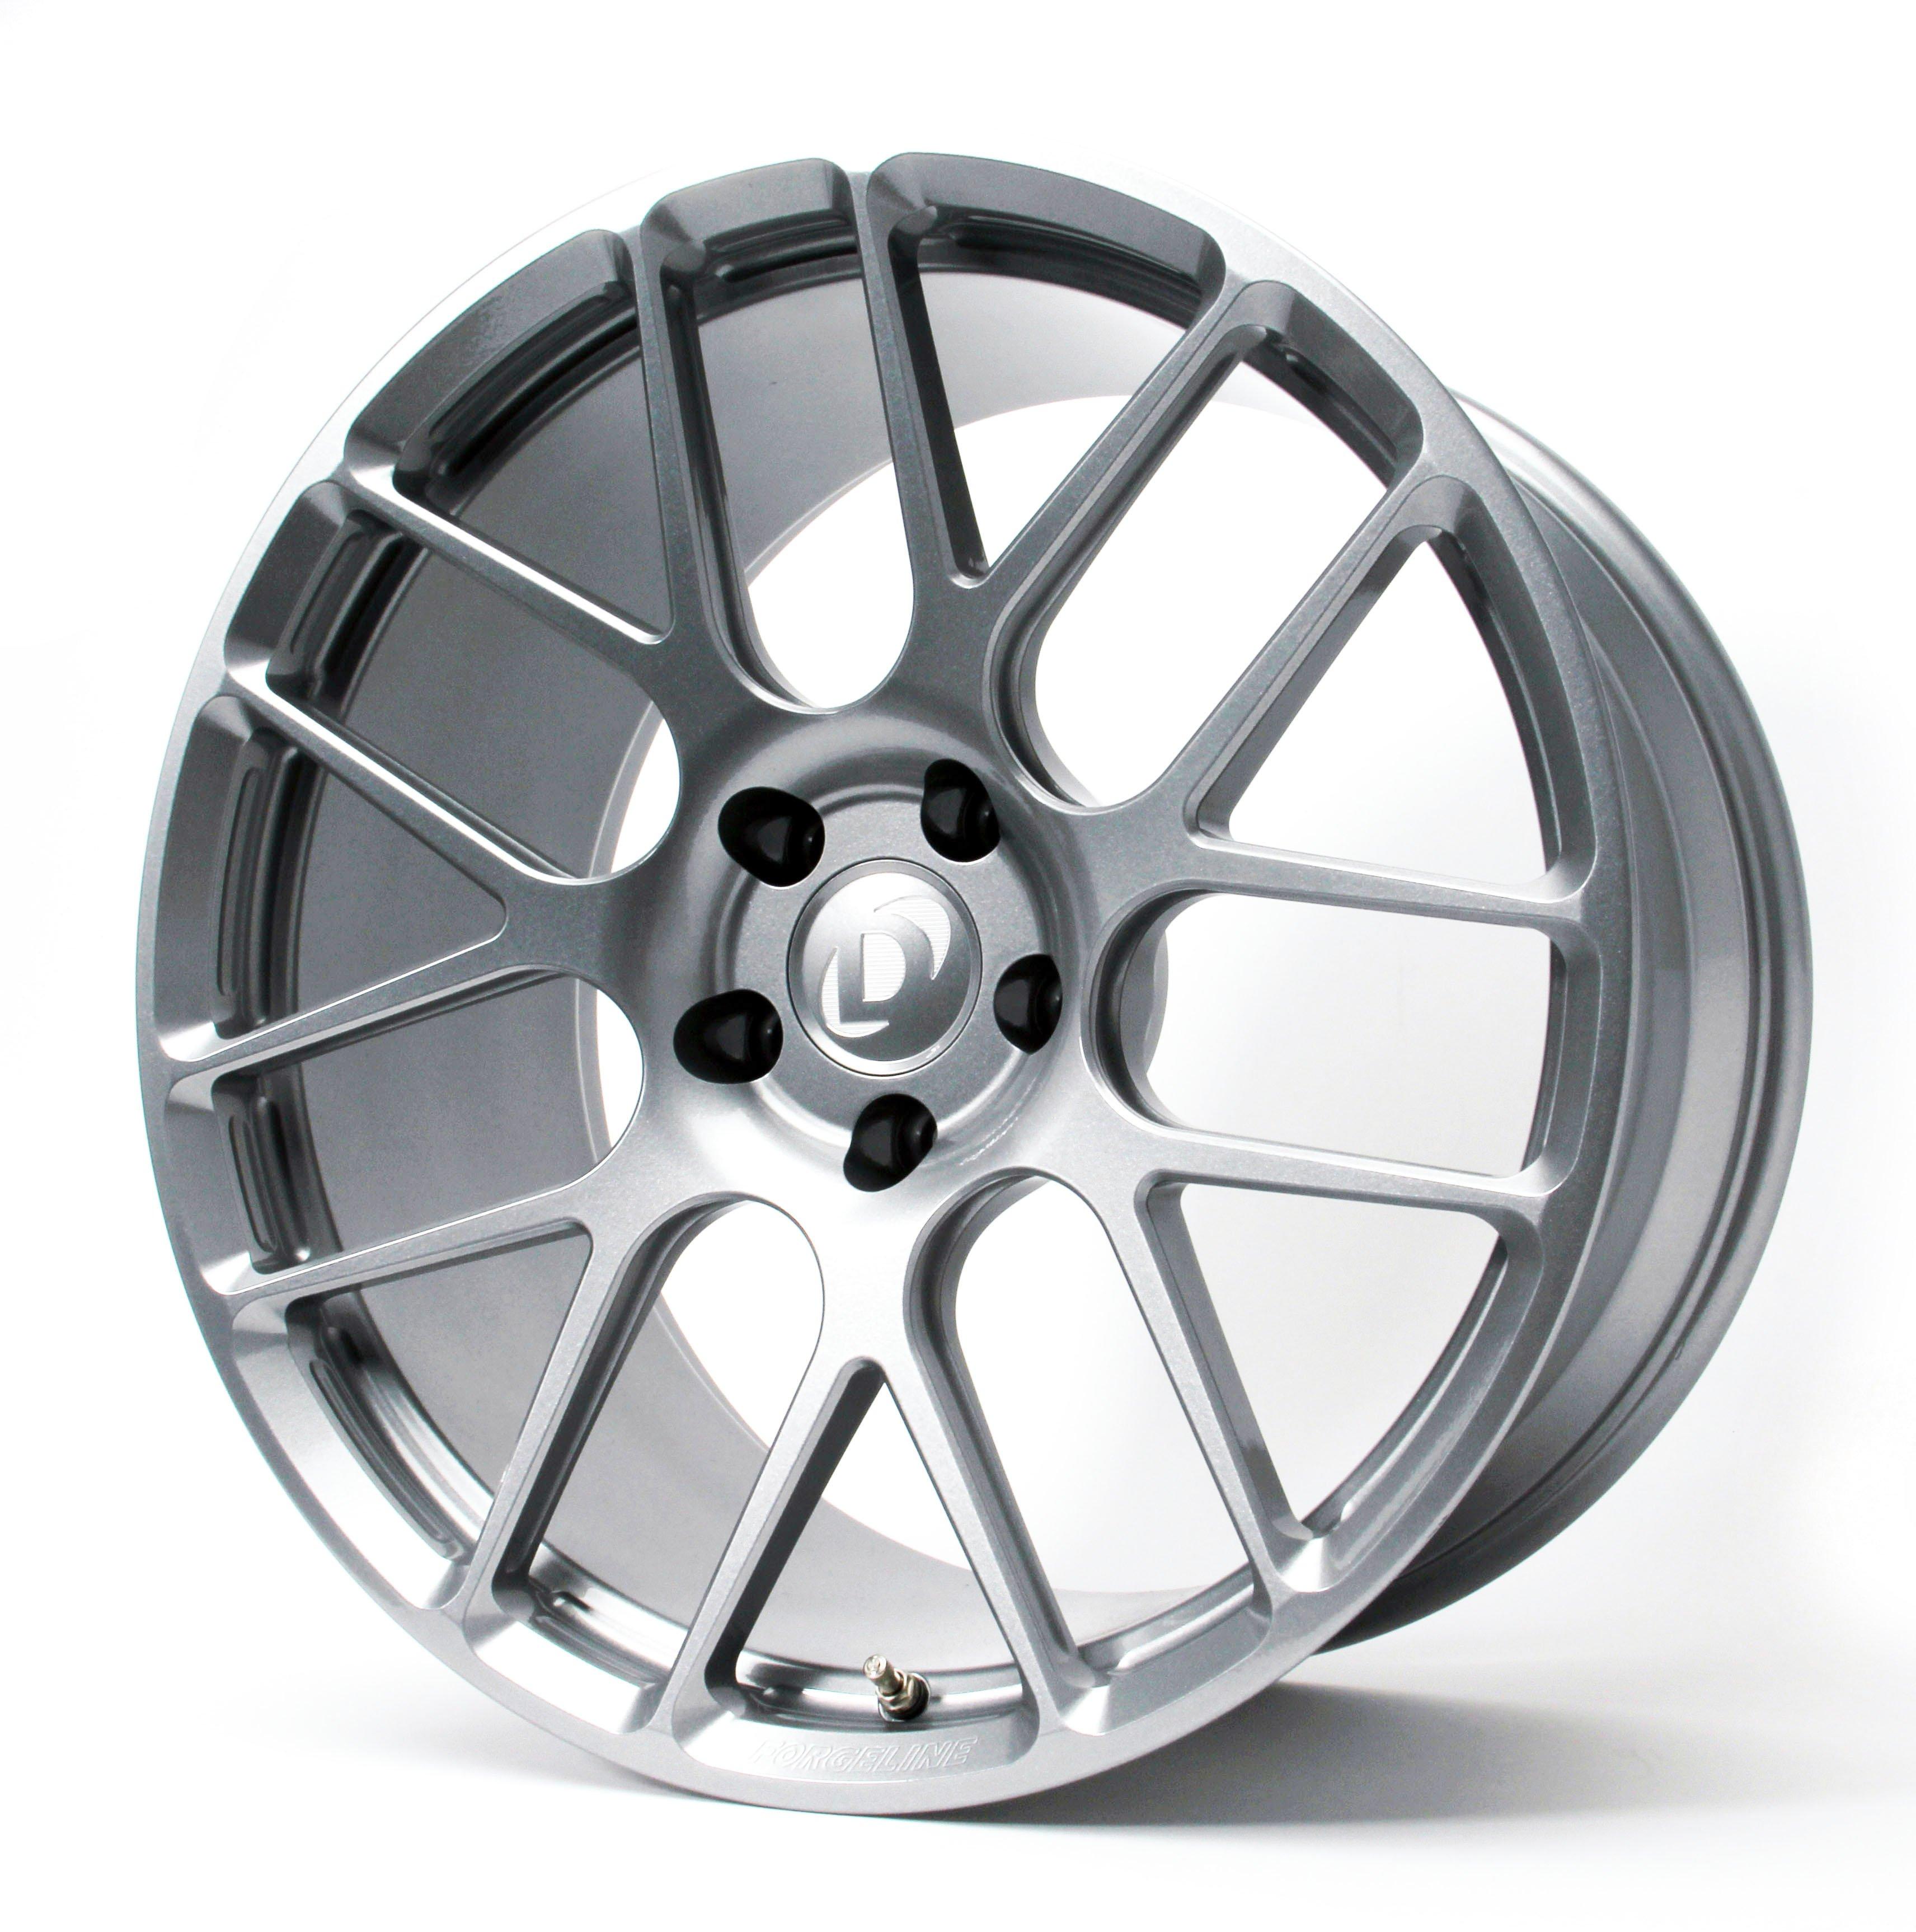 Dinan D750-0087-SE1-SIL Forgeline SE1 Performance Wheel